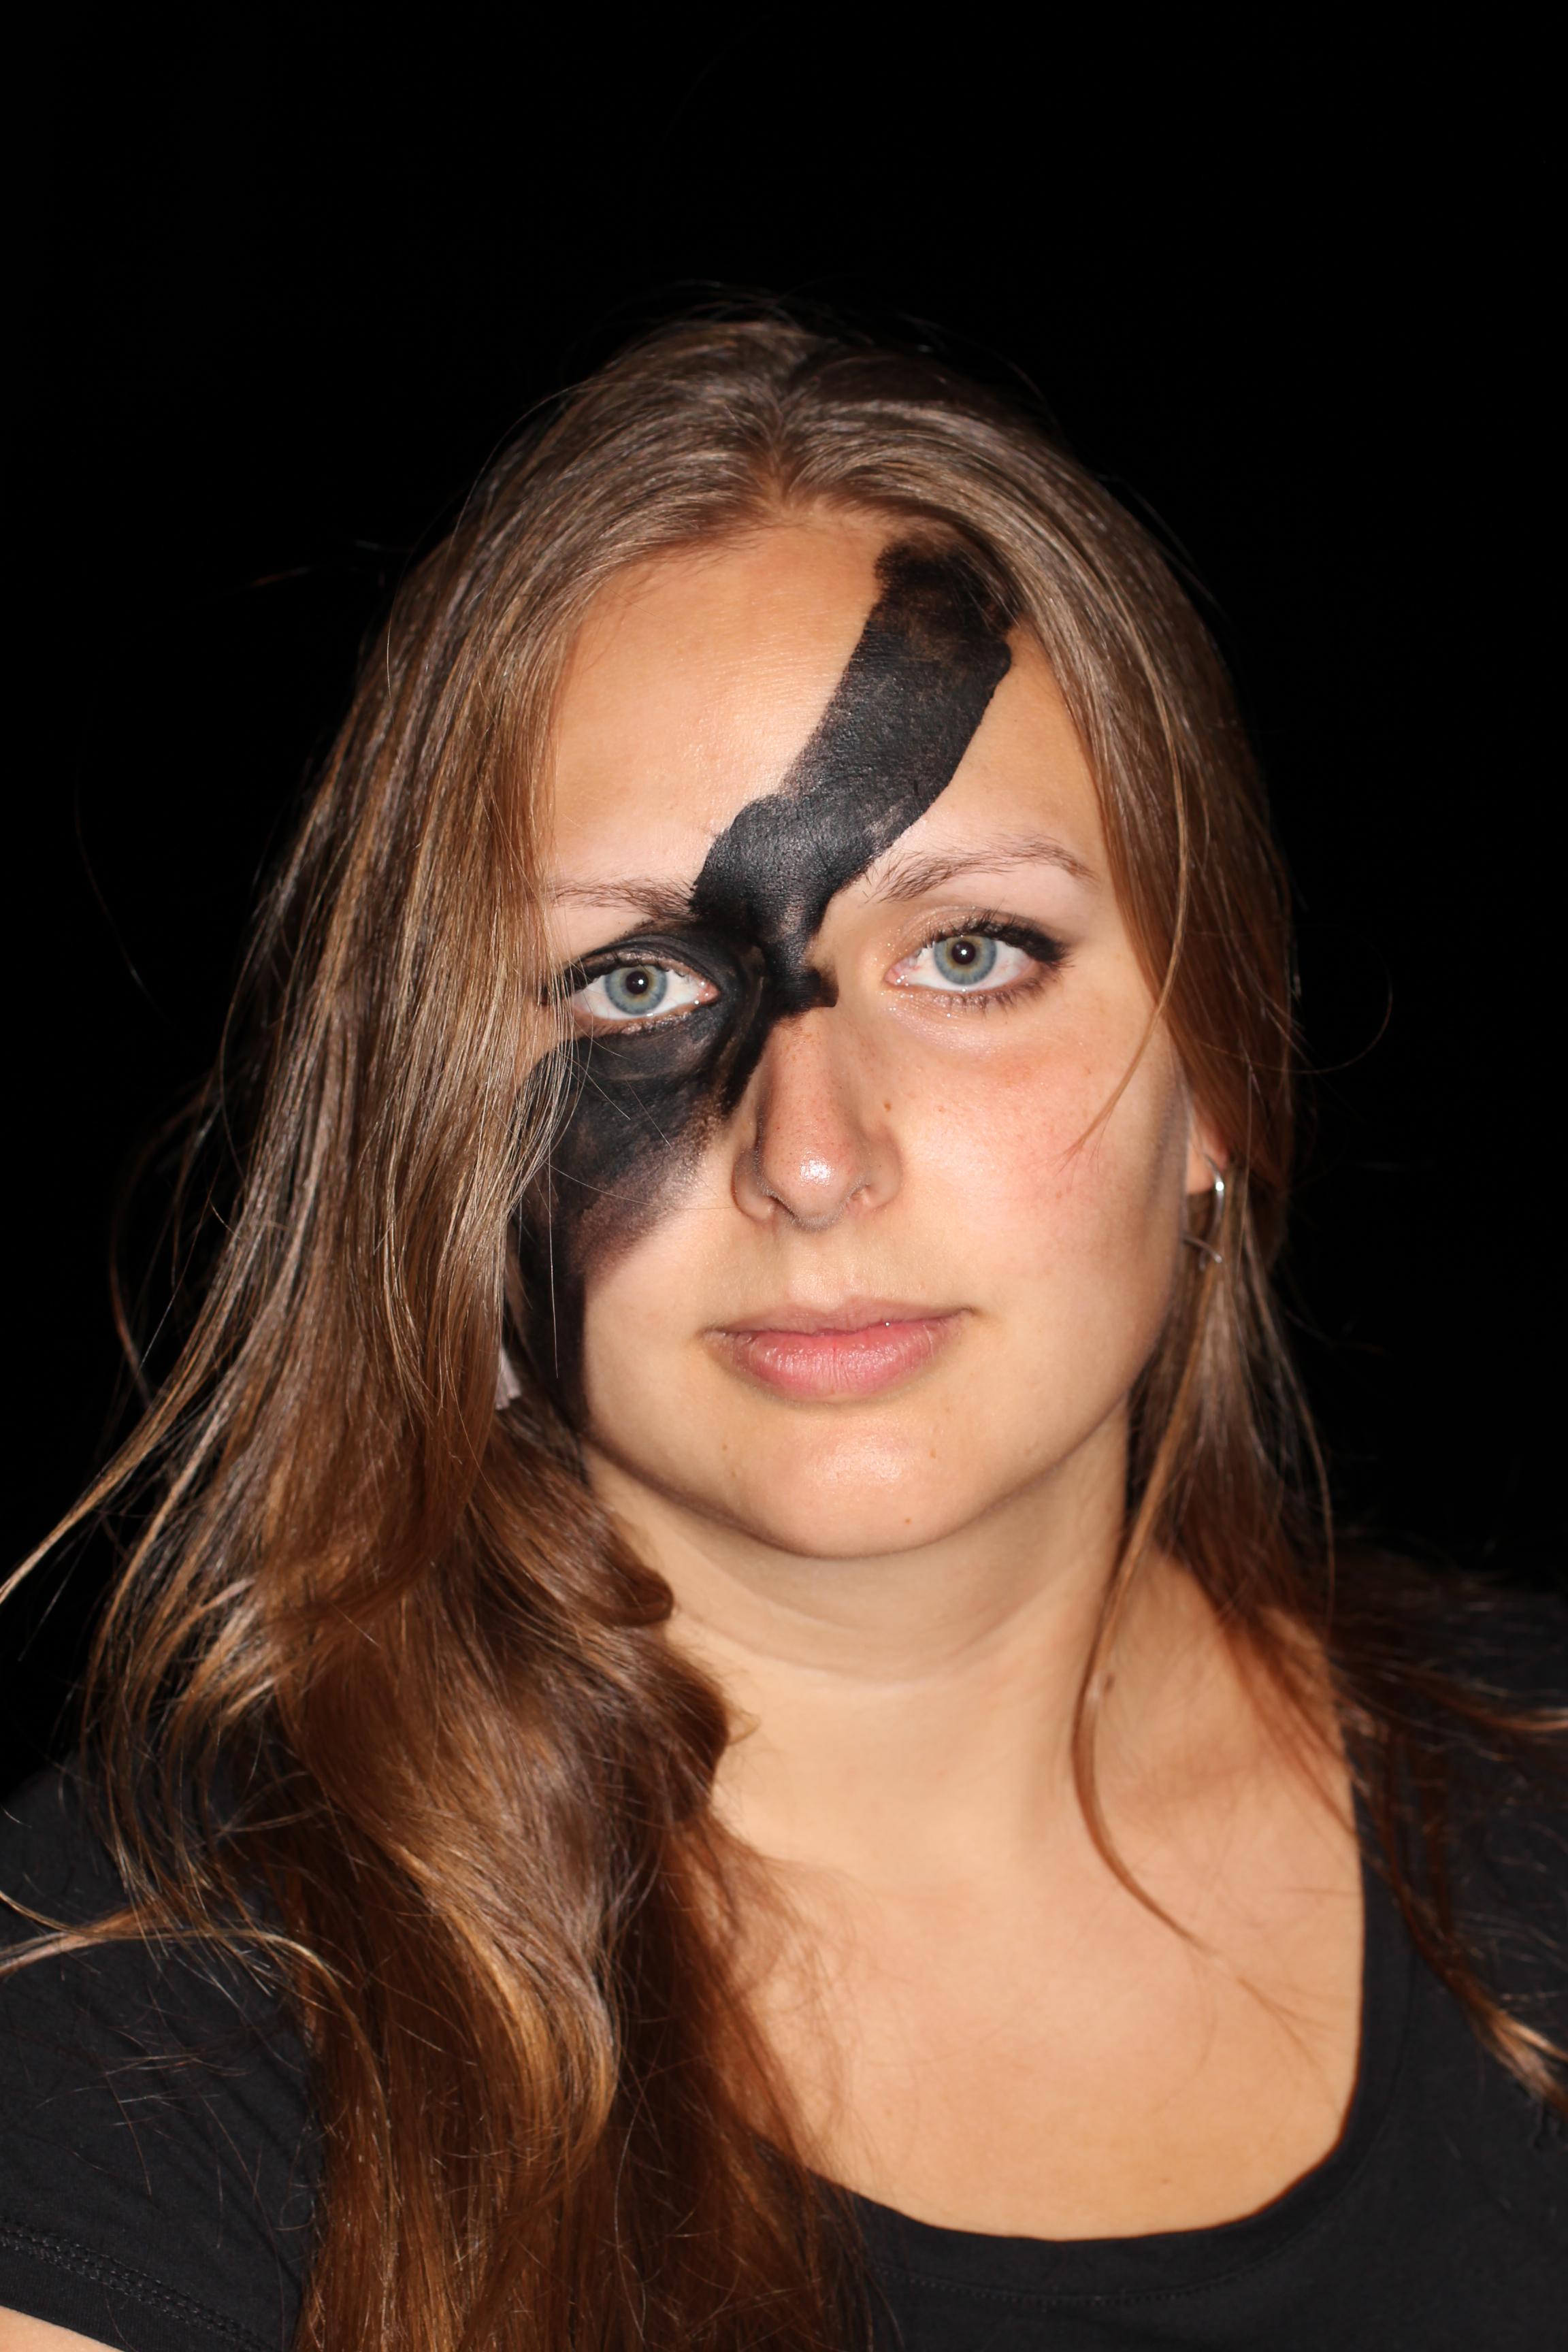 Natalie singer_band-leader portait